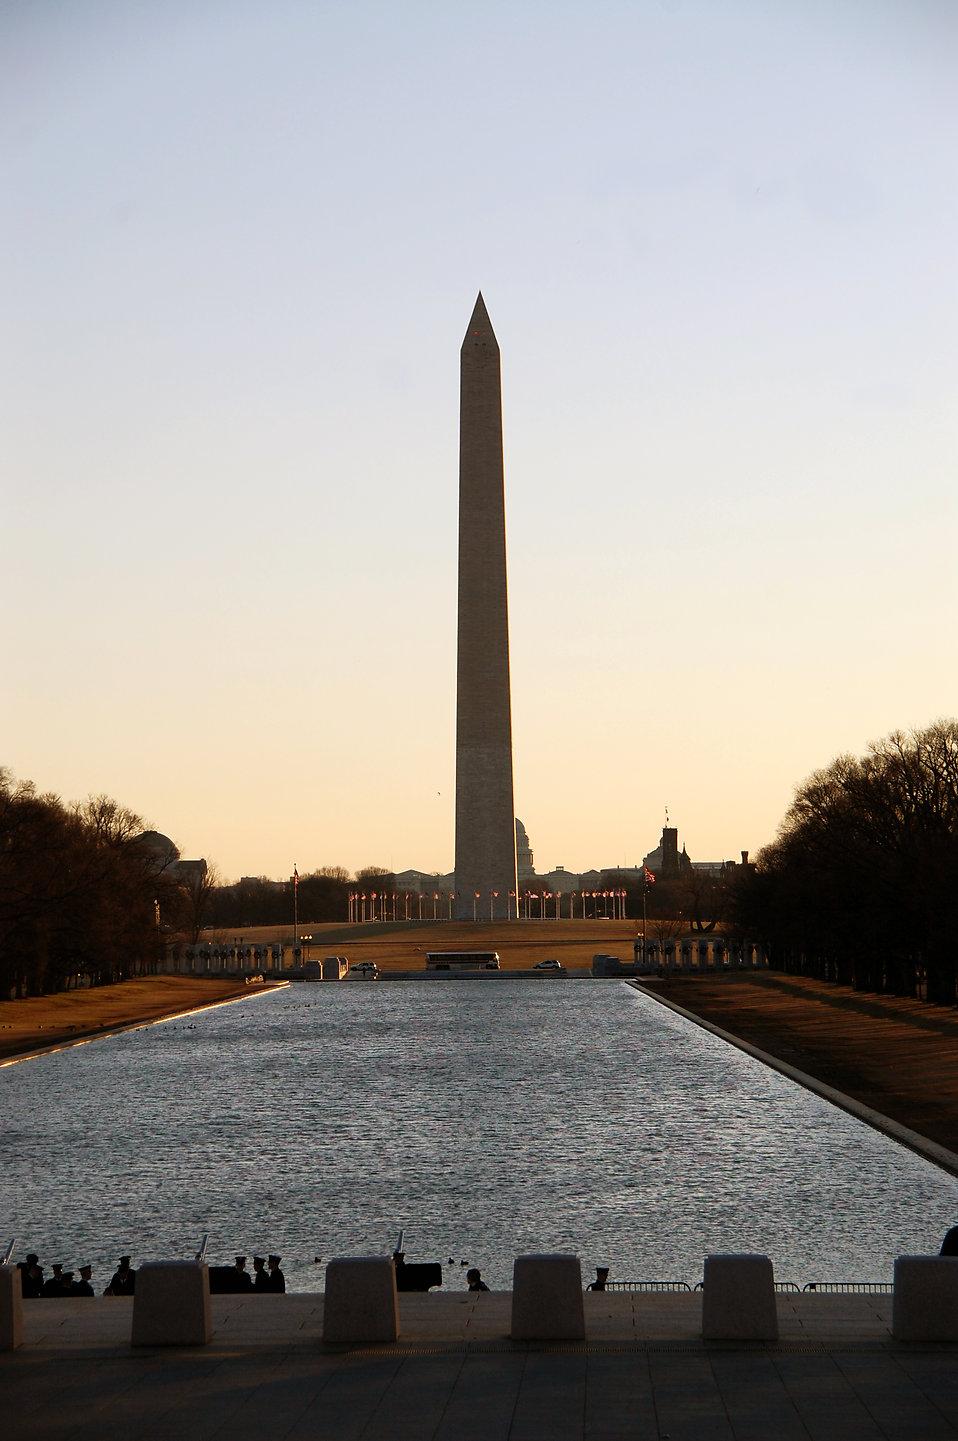 Washington Monument Free Stock Photo The Washington